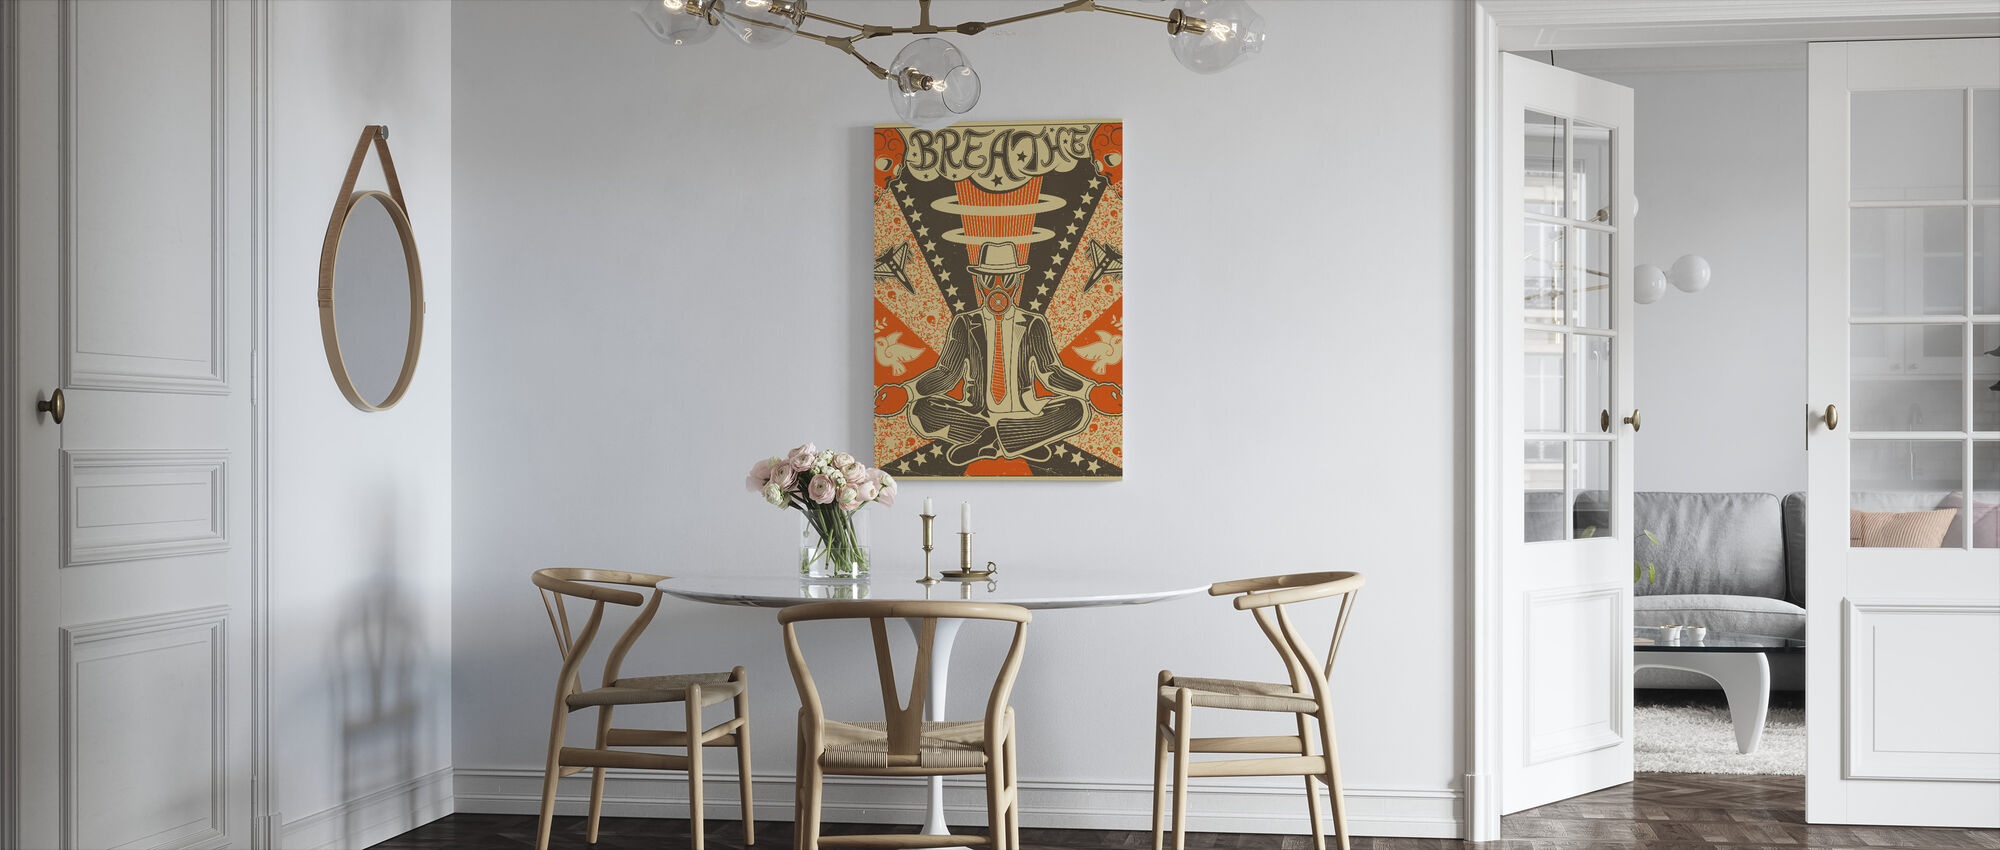 Breathe - Canvas print - Kitchen